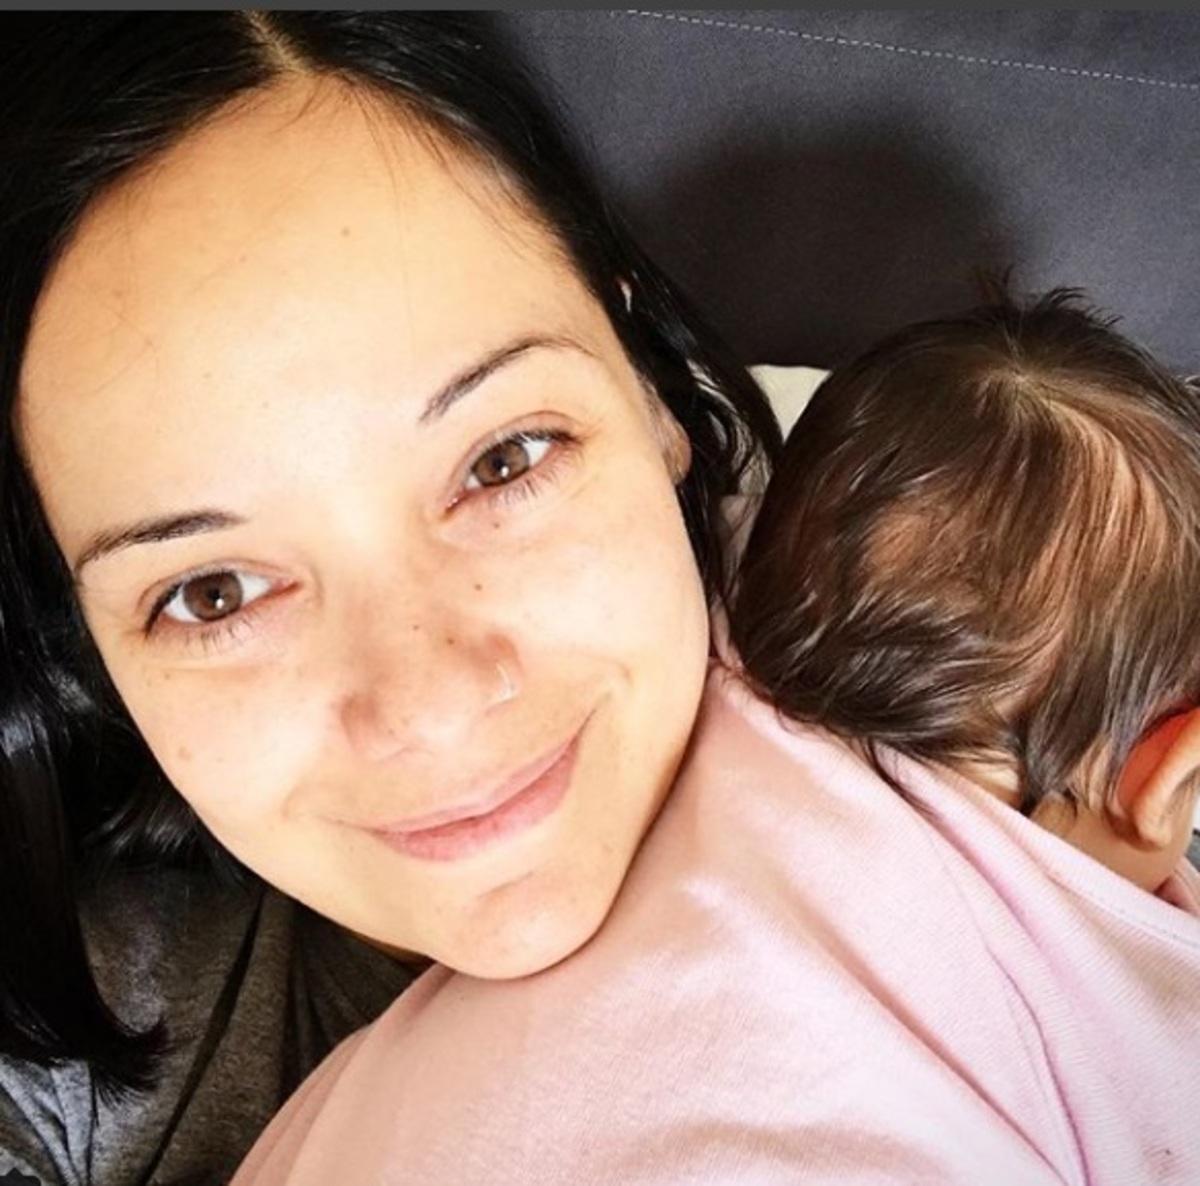 Kατερίνα Τσάβαλου: Με την μπέμπα της στα γενέθλια του Μπρούνο Τσιρίλο! Bίντεο | Newsit.gr